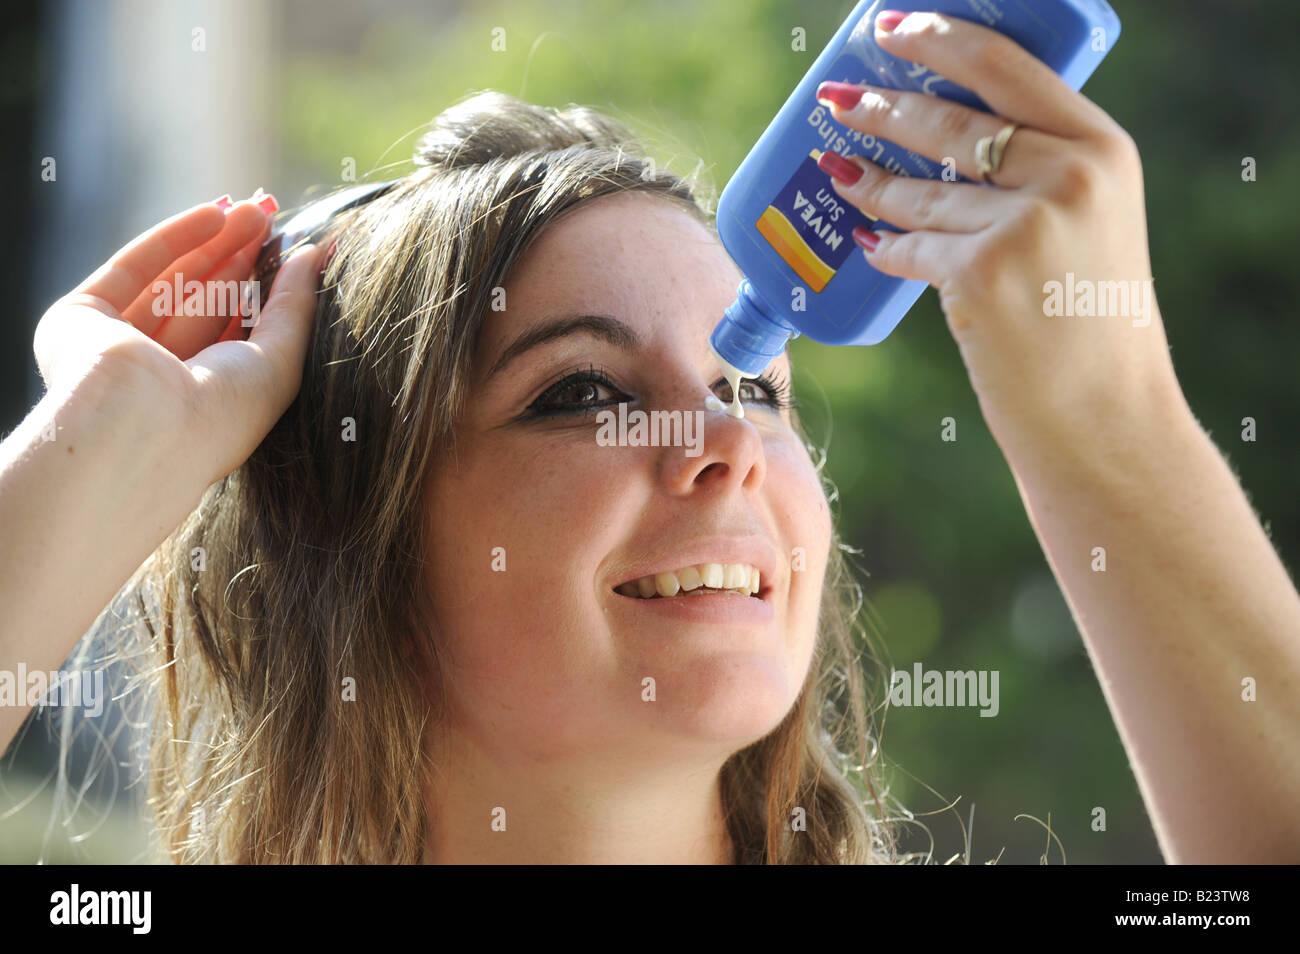 Teenage girl applying sun tan lotion to her face - Stock Image